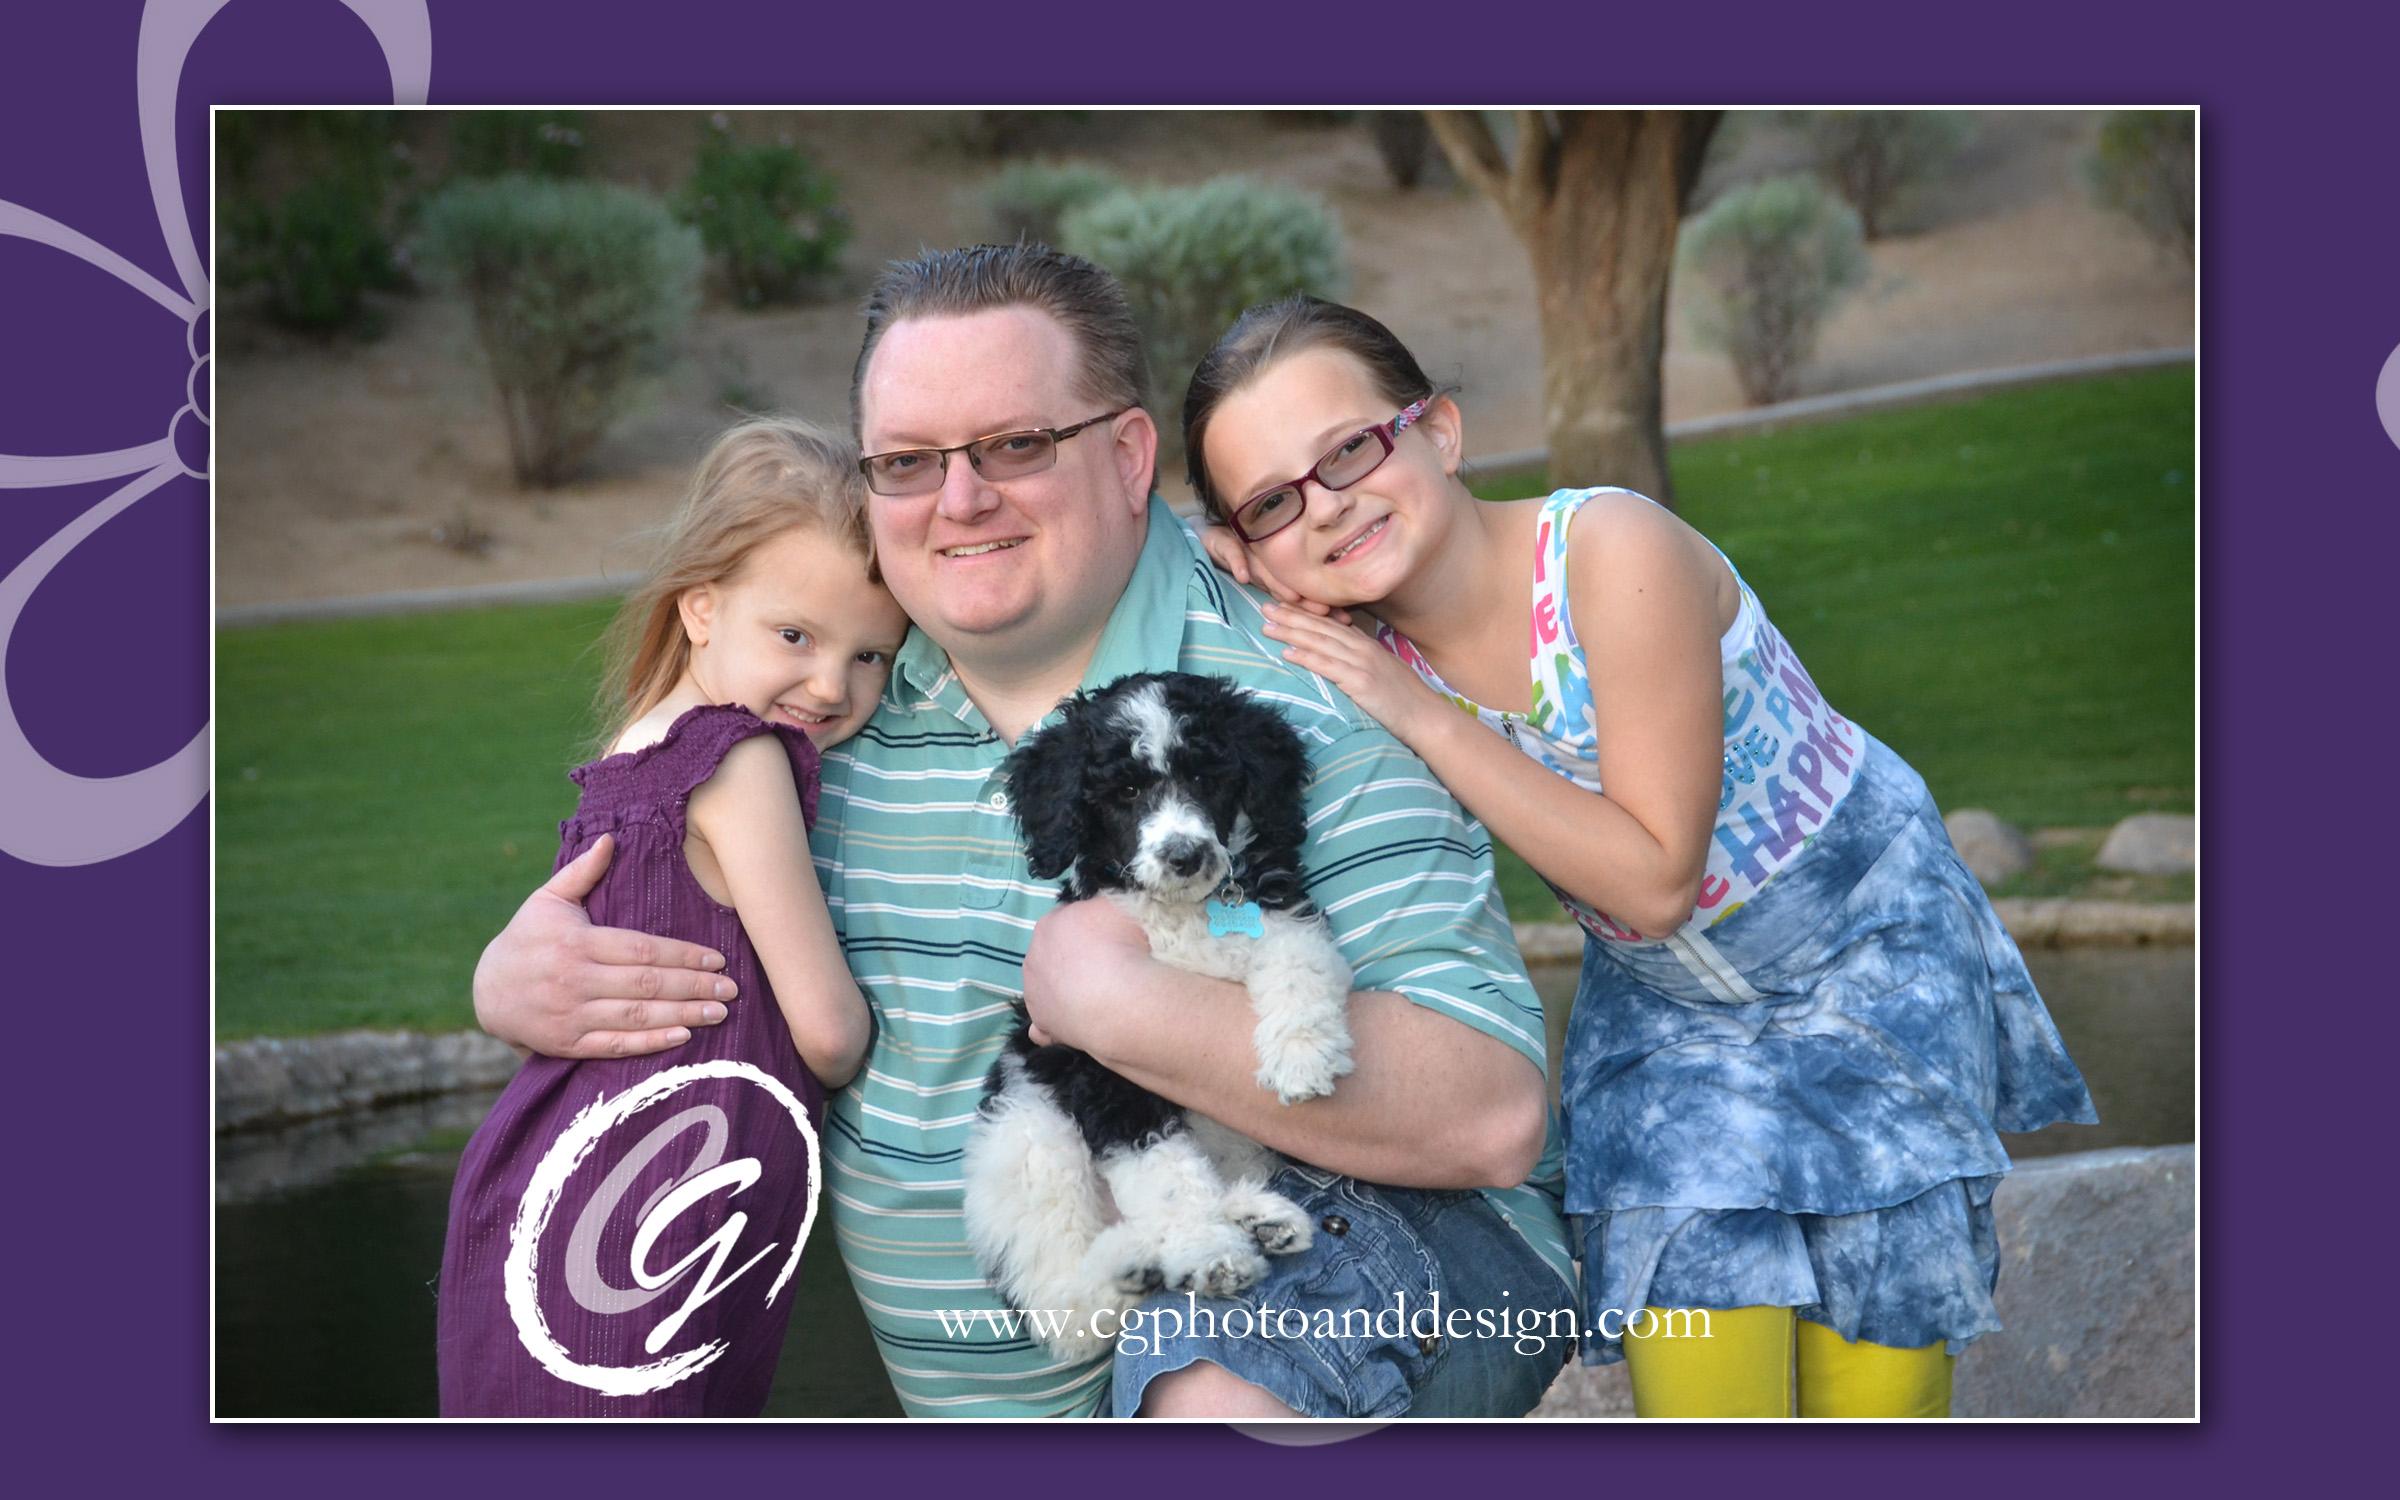 Puppy-dog-portrait-photographer-family